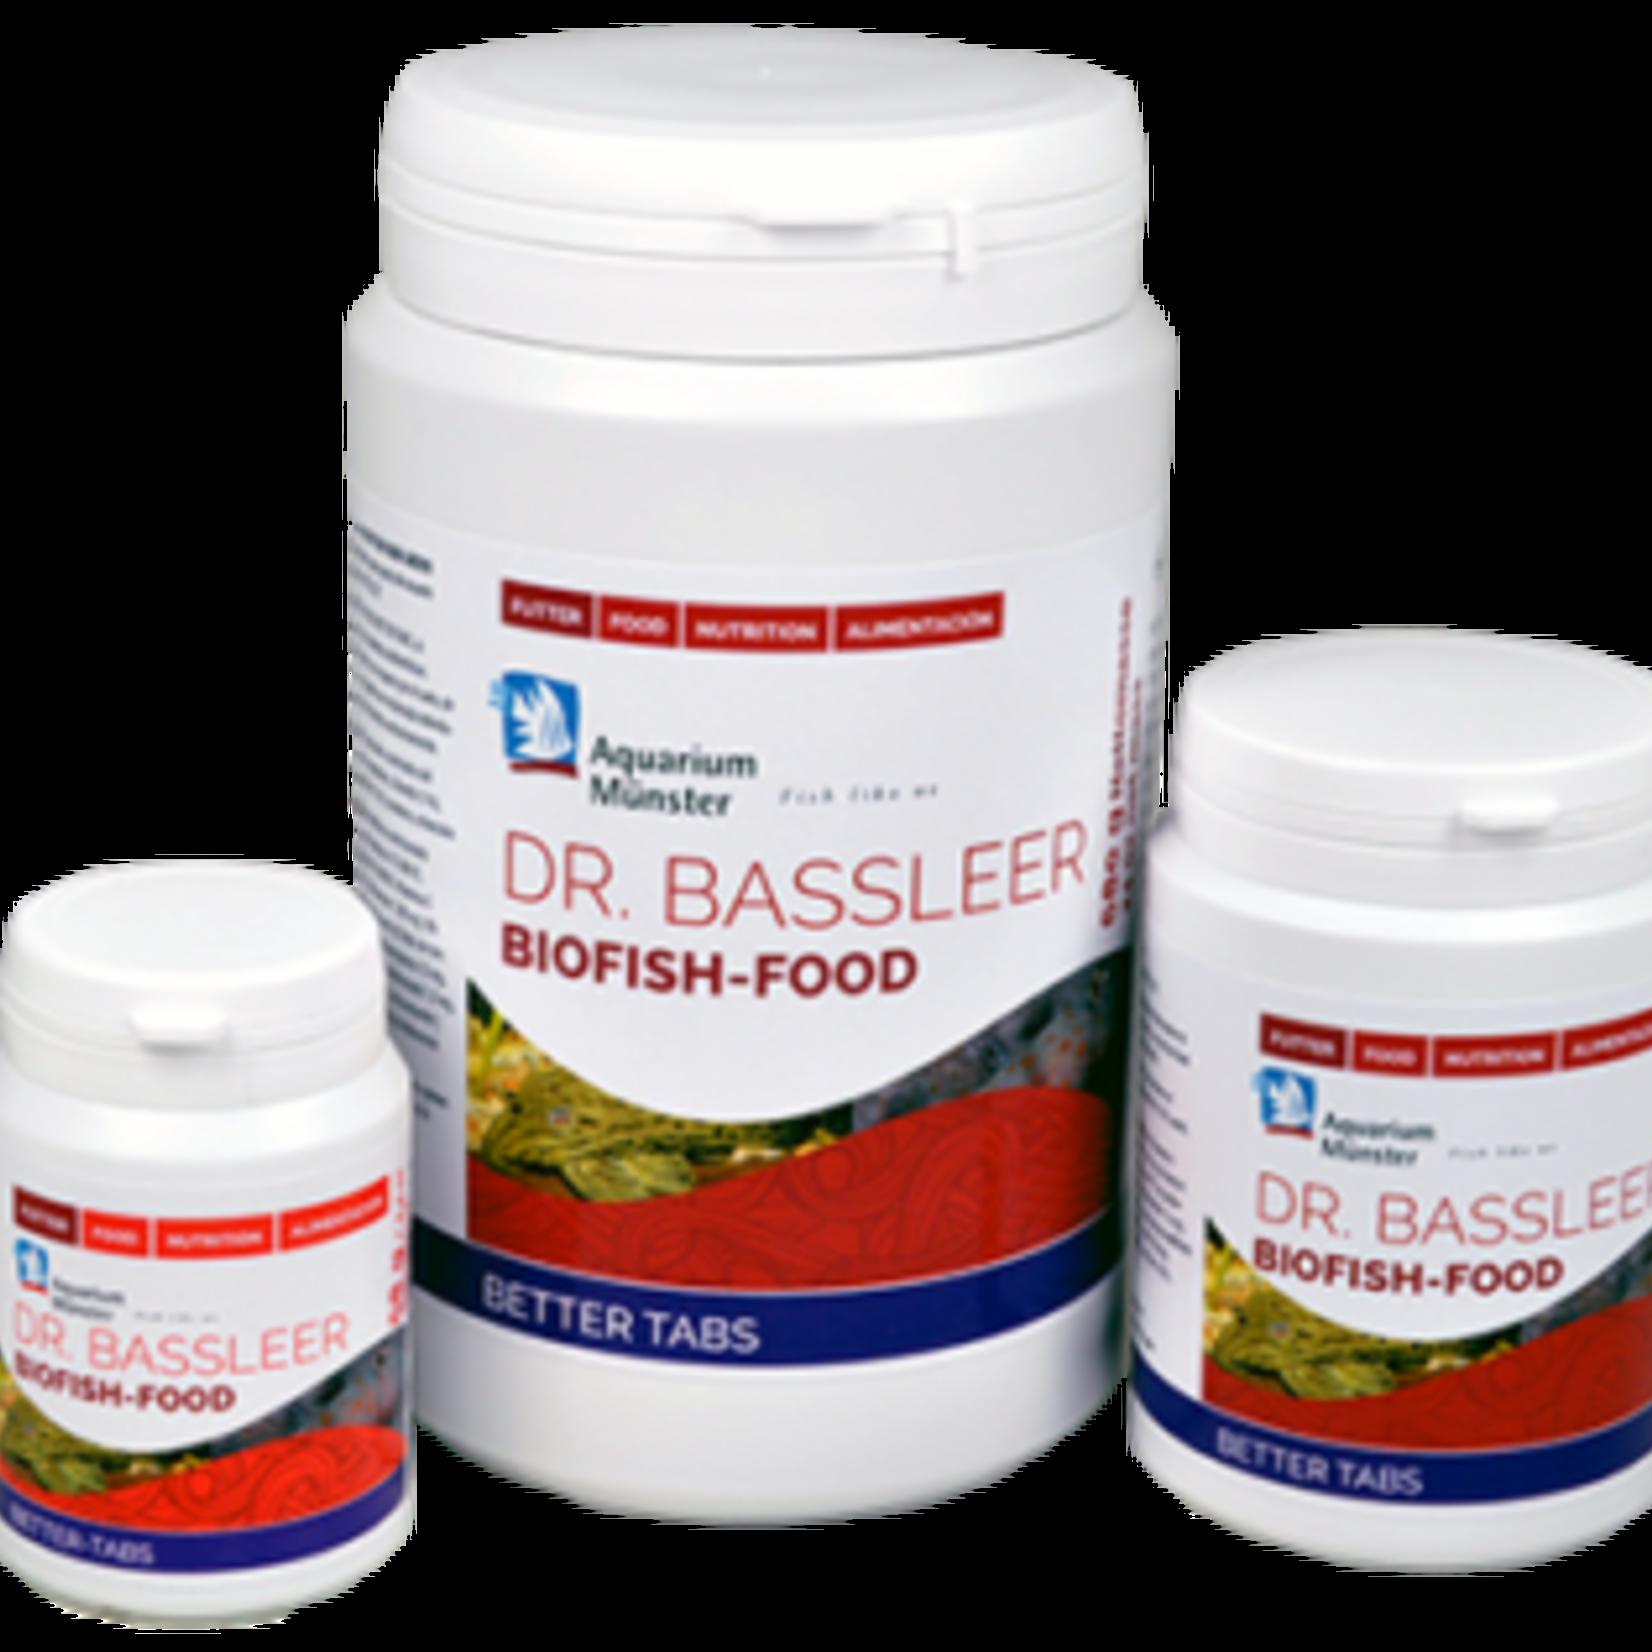 BioFishFood Dr Bassleer - Betere tabbladen